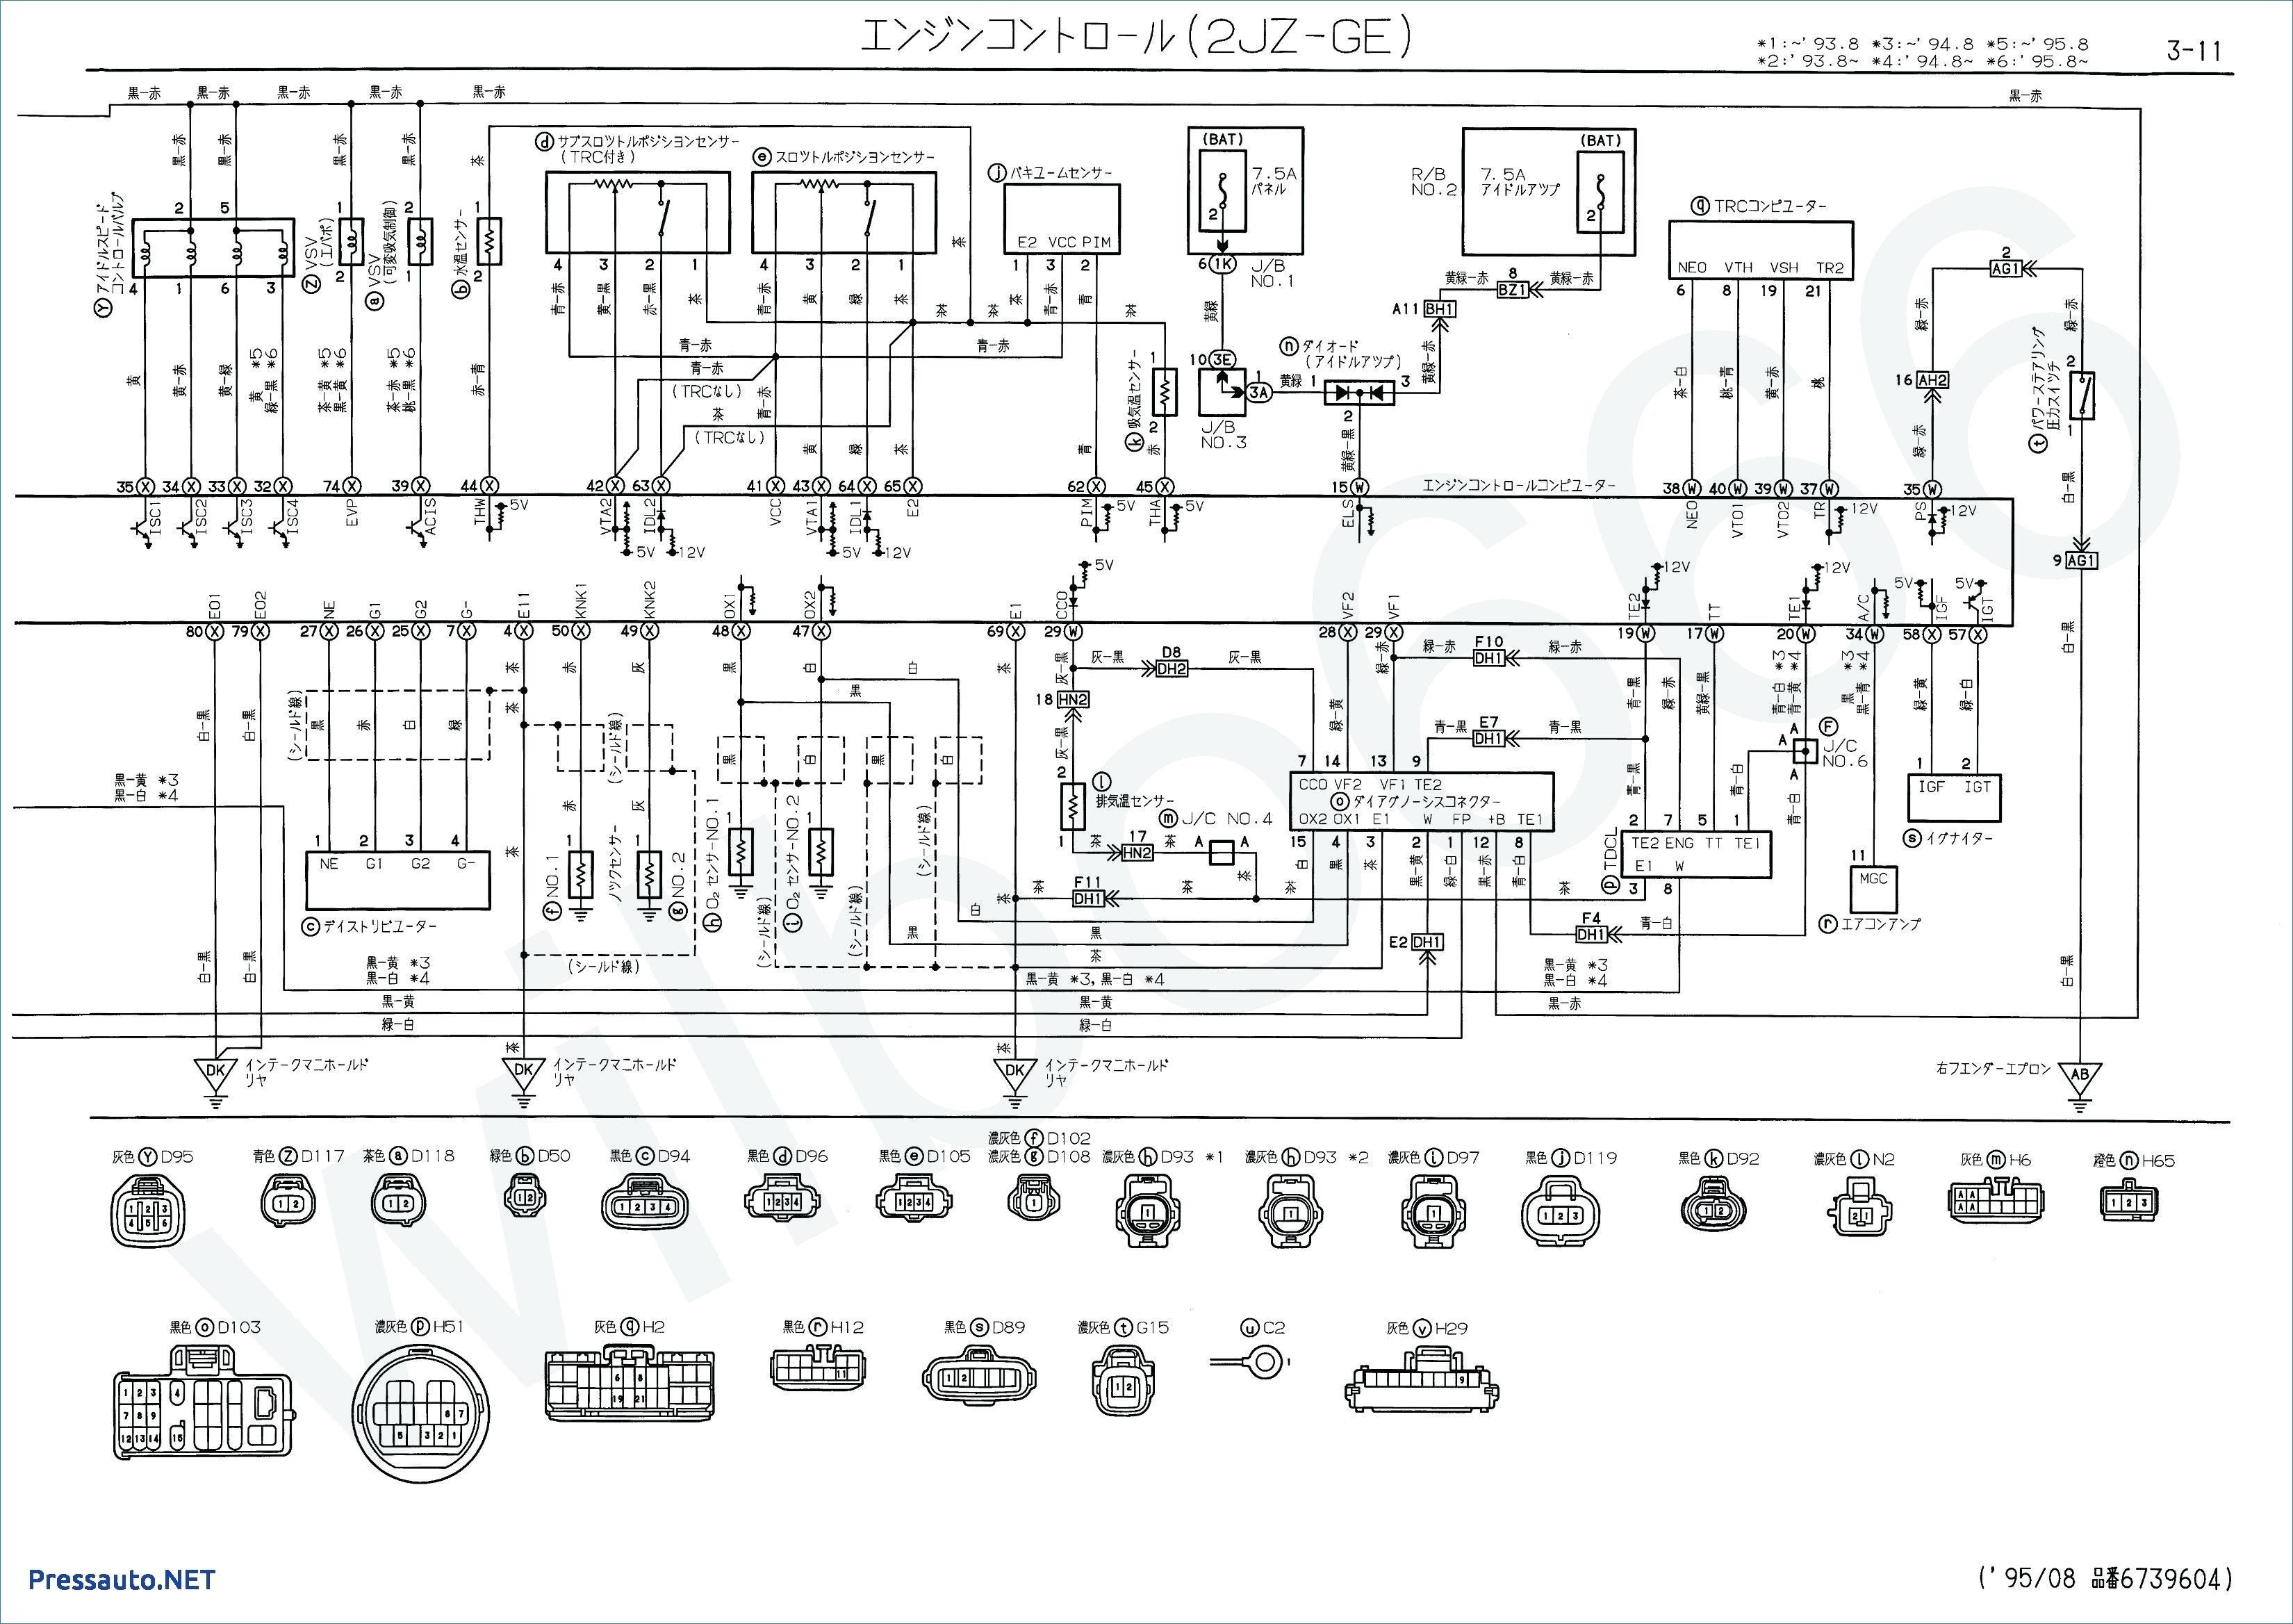 ge dryer timer schematic simple wiring diagram page rh 9 9 reds baseball academy de ge